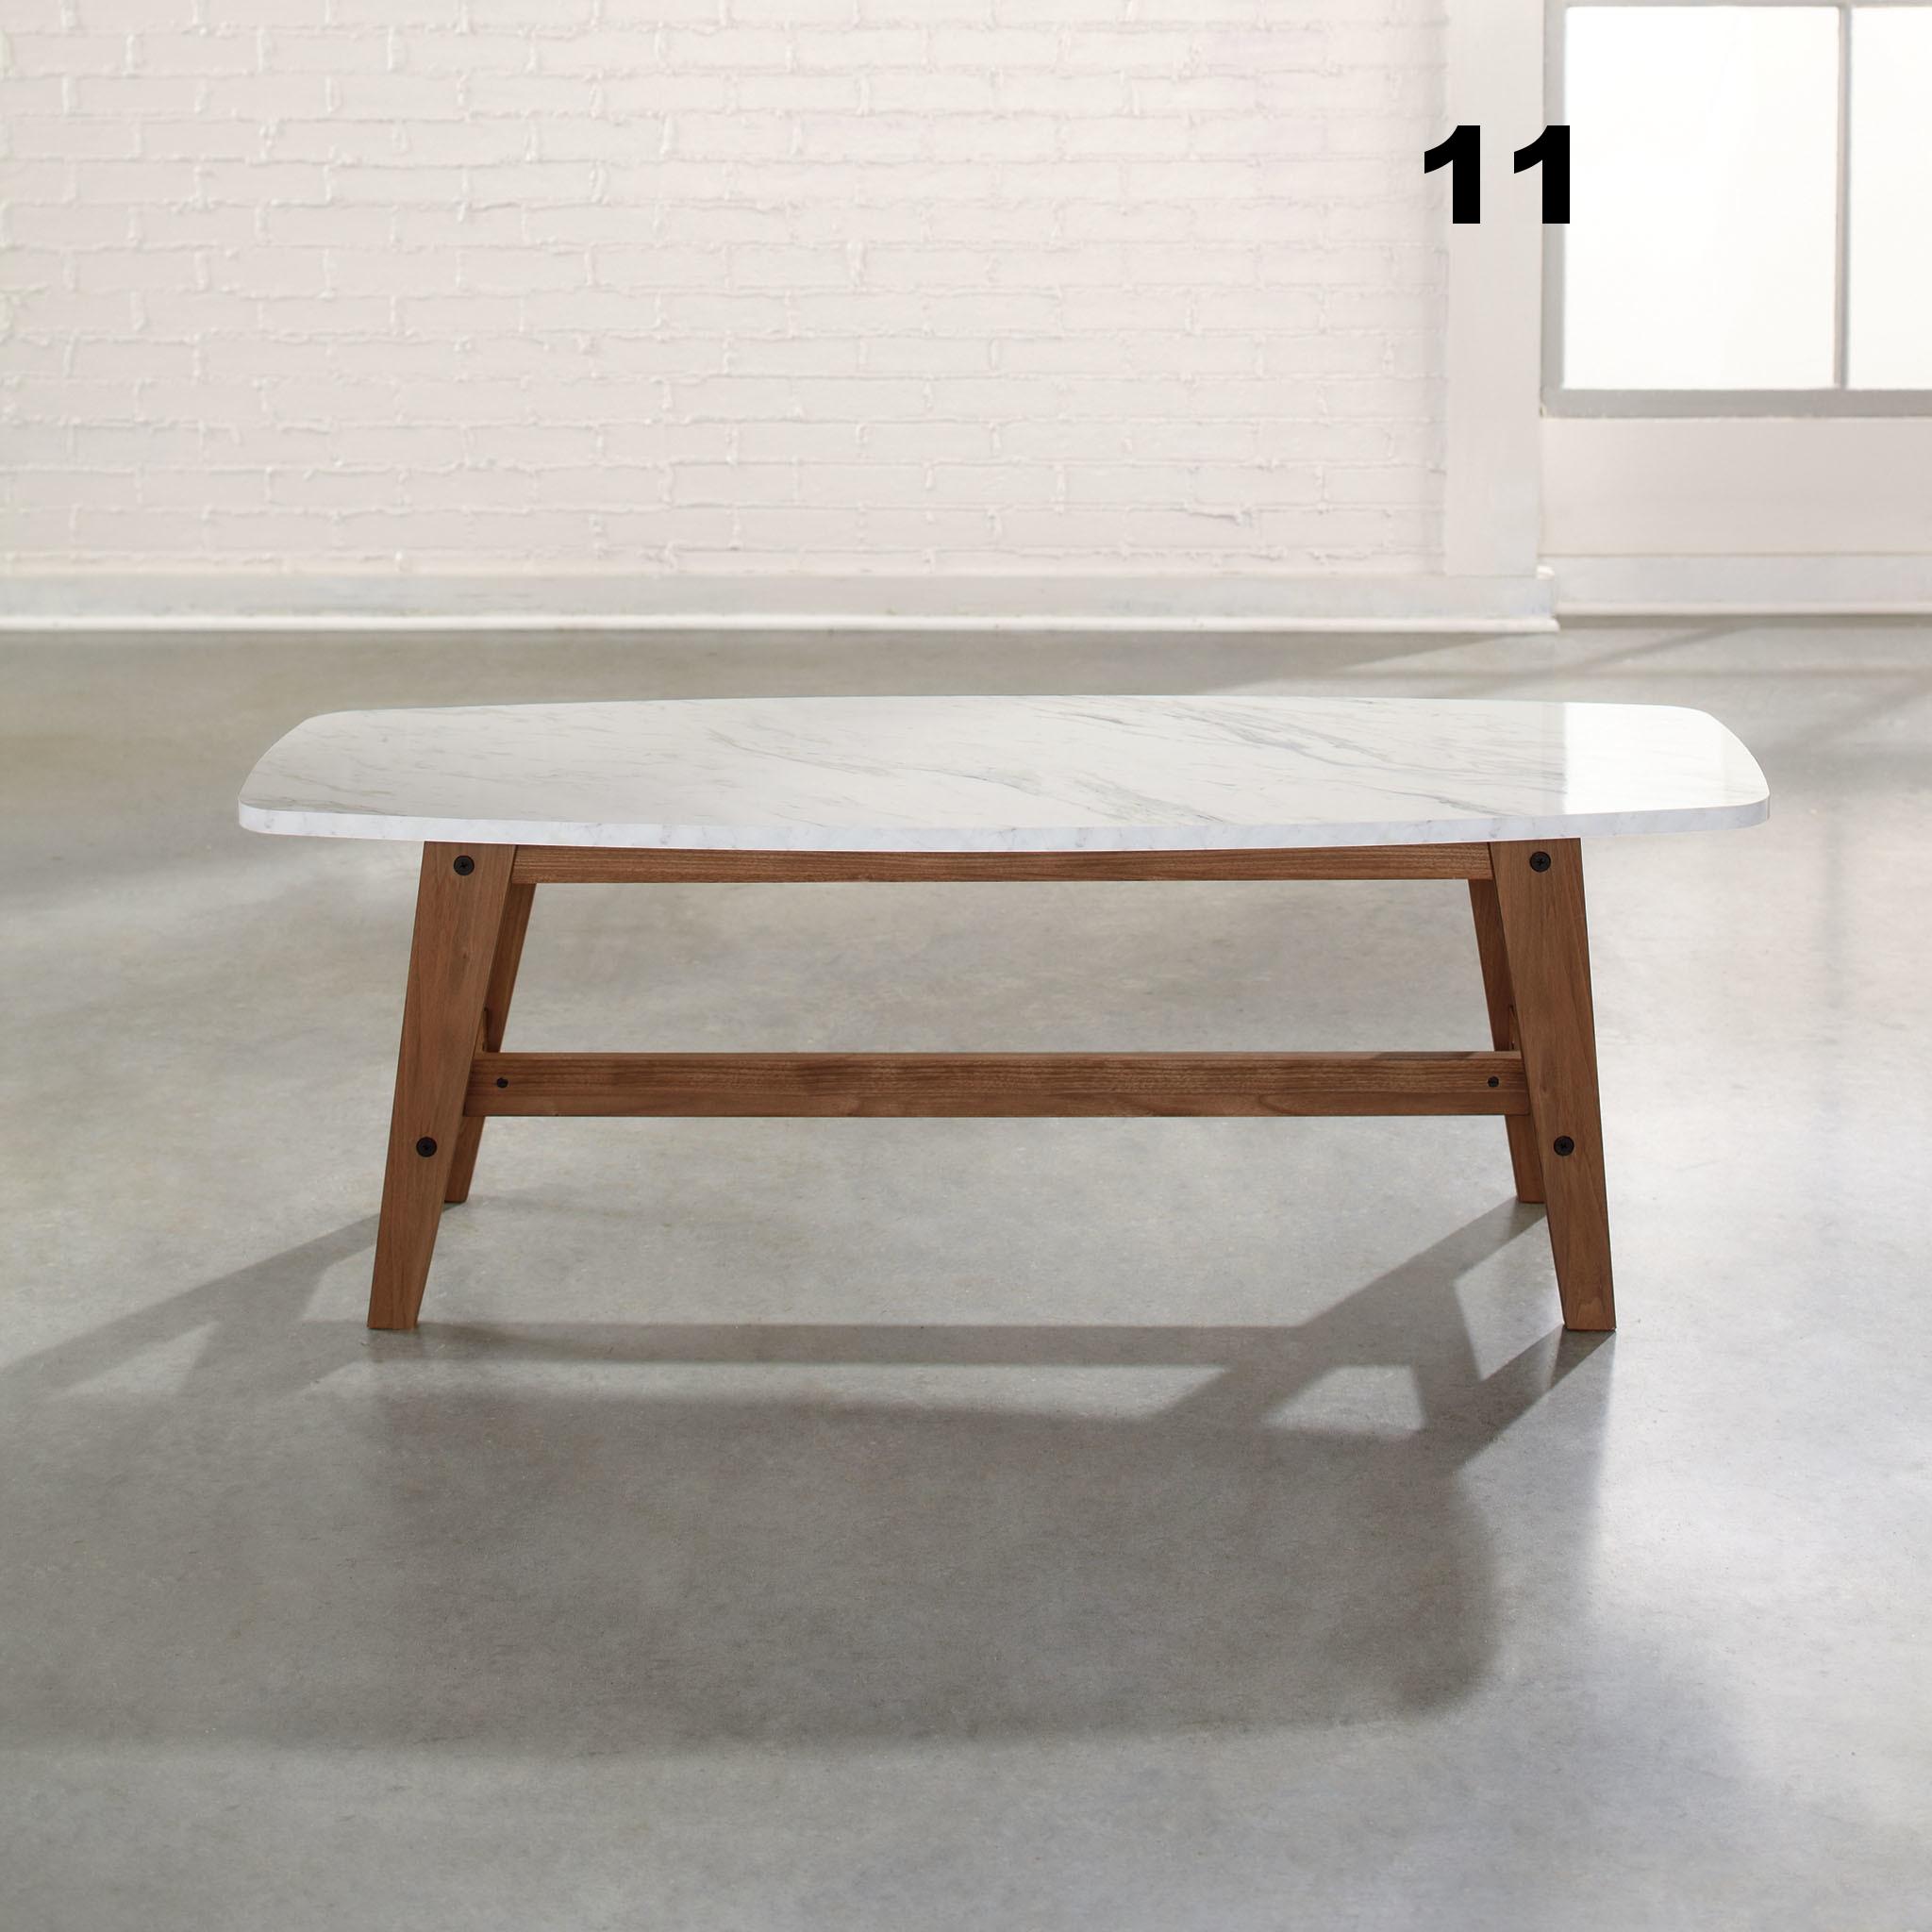 Pryer-Coffee-Table-VKGL3671 (1).jpg